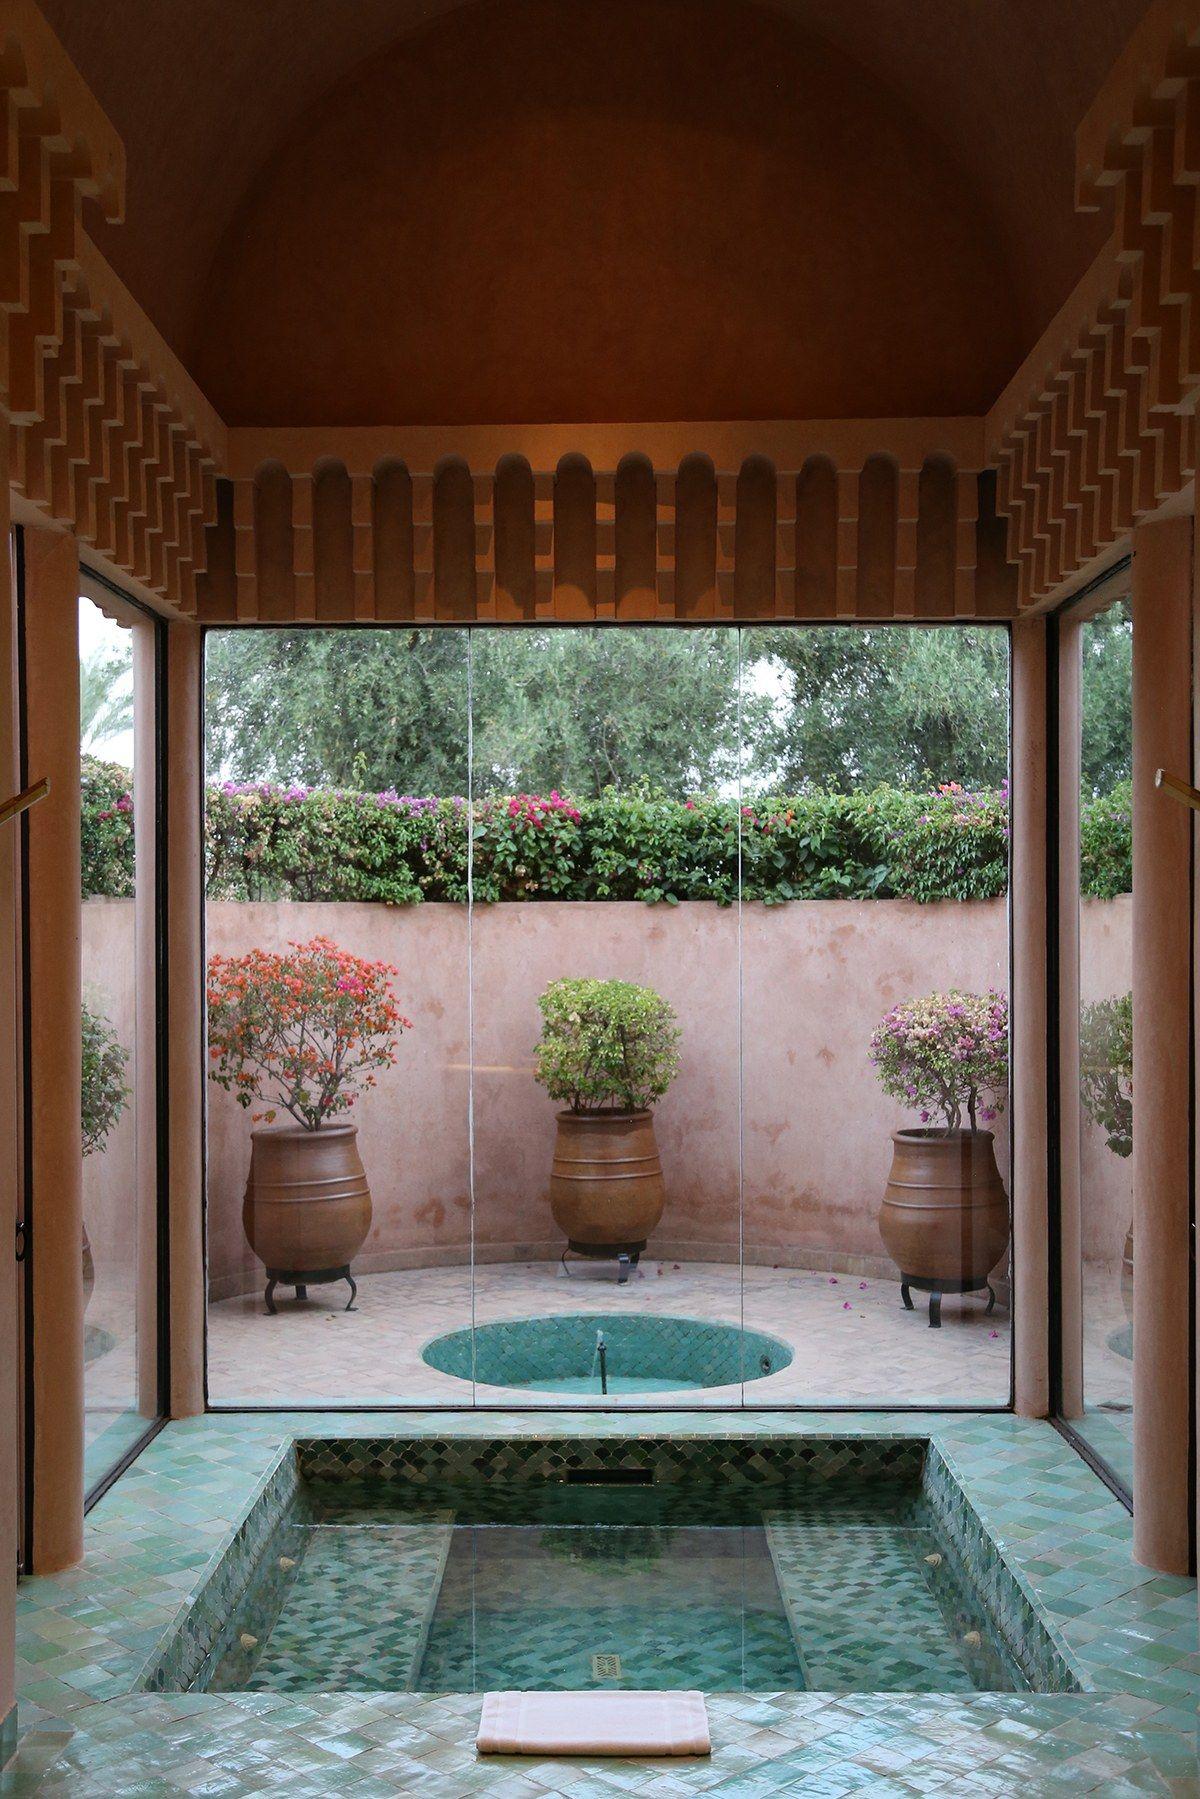 How To Experience A Hammam In Marrakech Like A Local Hammam Maison Maison Moderne Maisons Exterieures